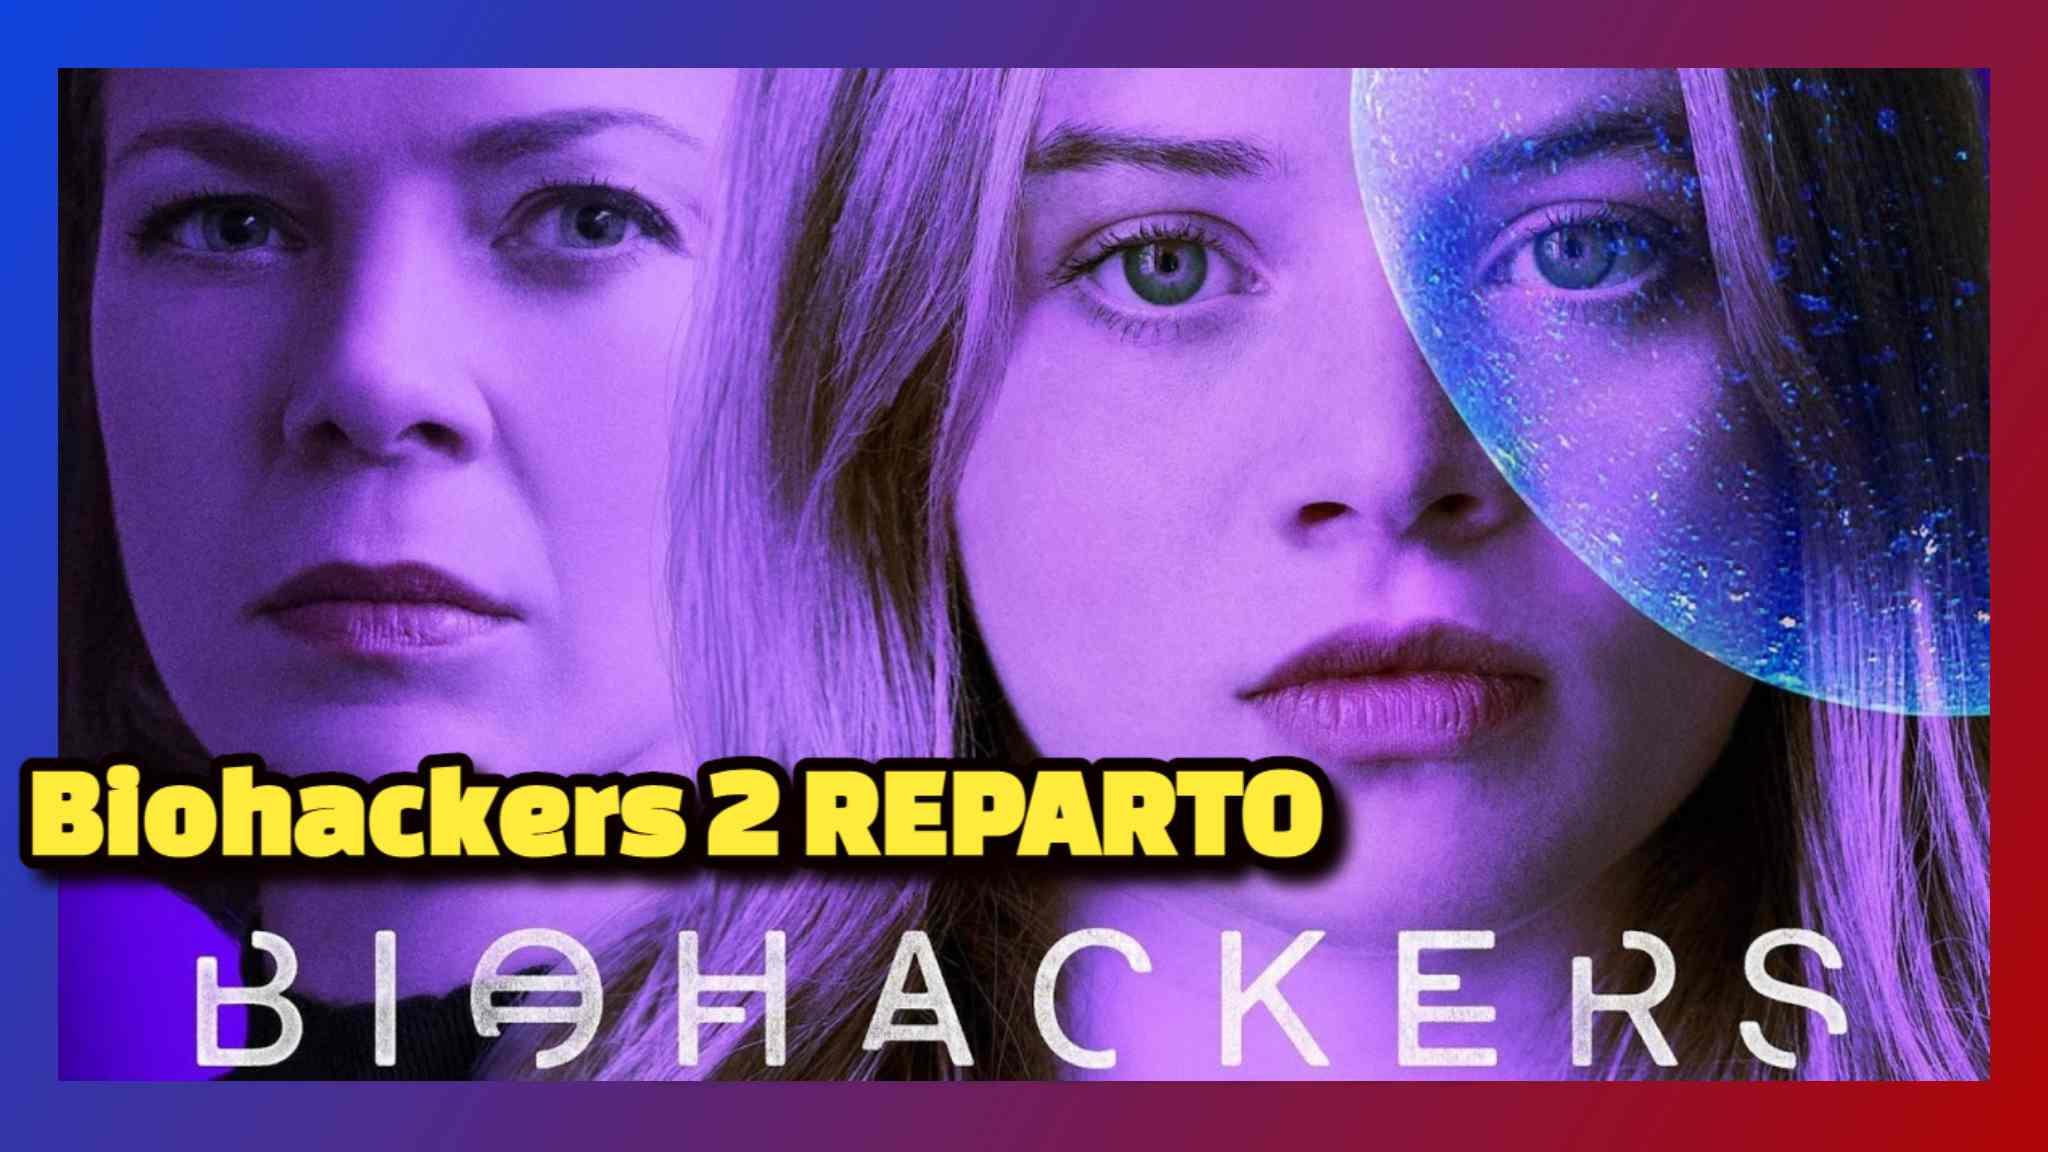 Biohackers 2 REPARTOBiohackers 2 REPARTO